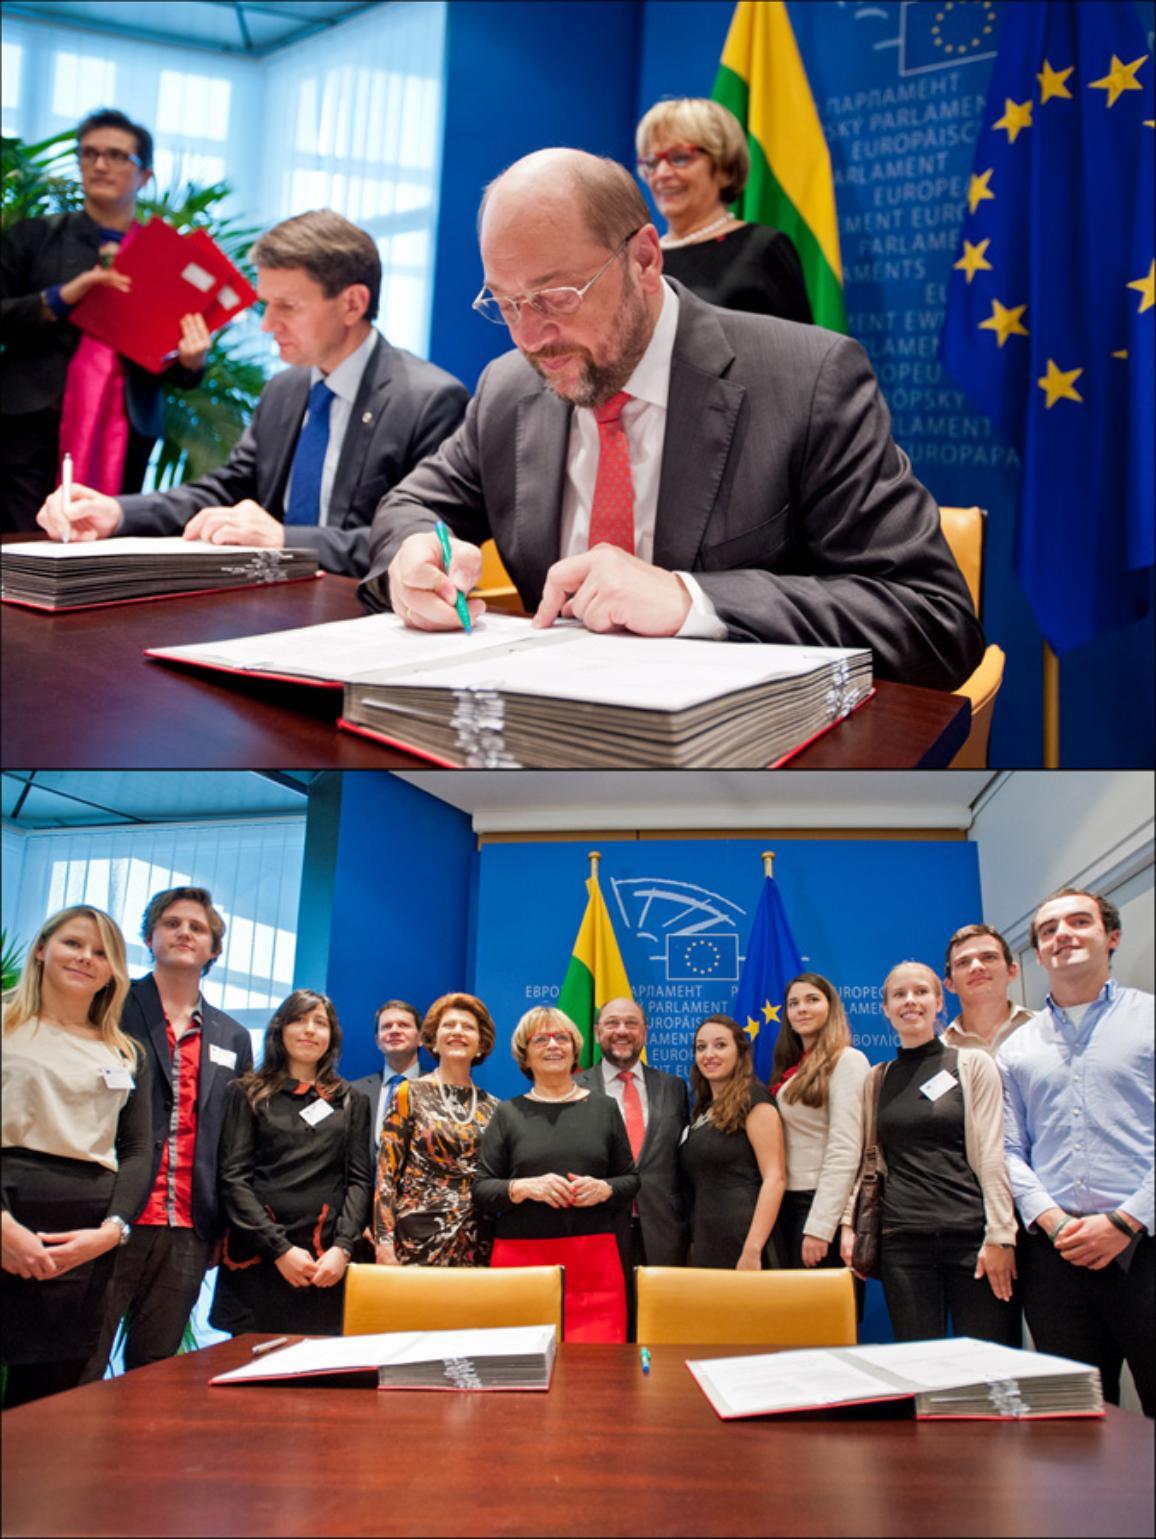 EP-Voorzitter Martin Schulz